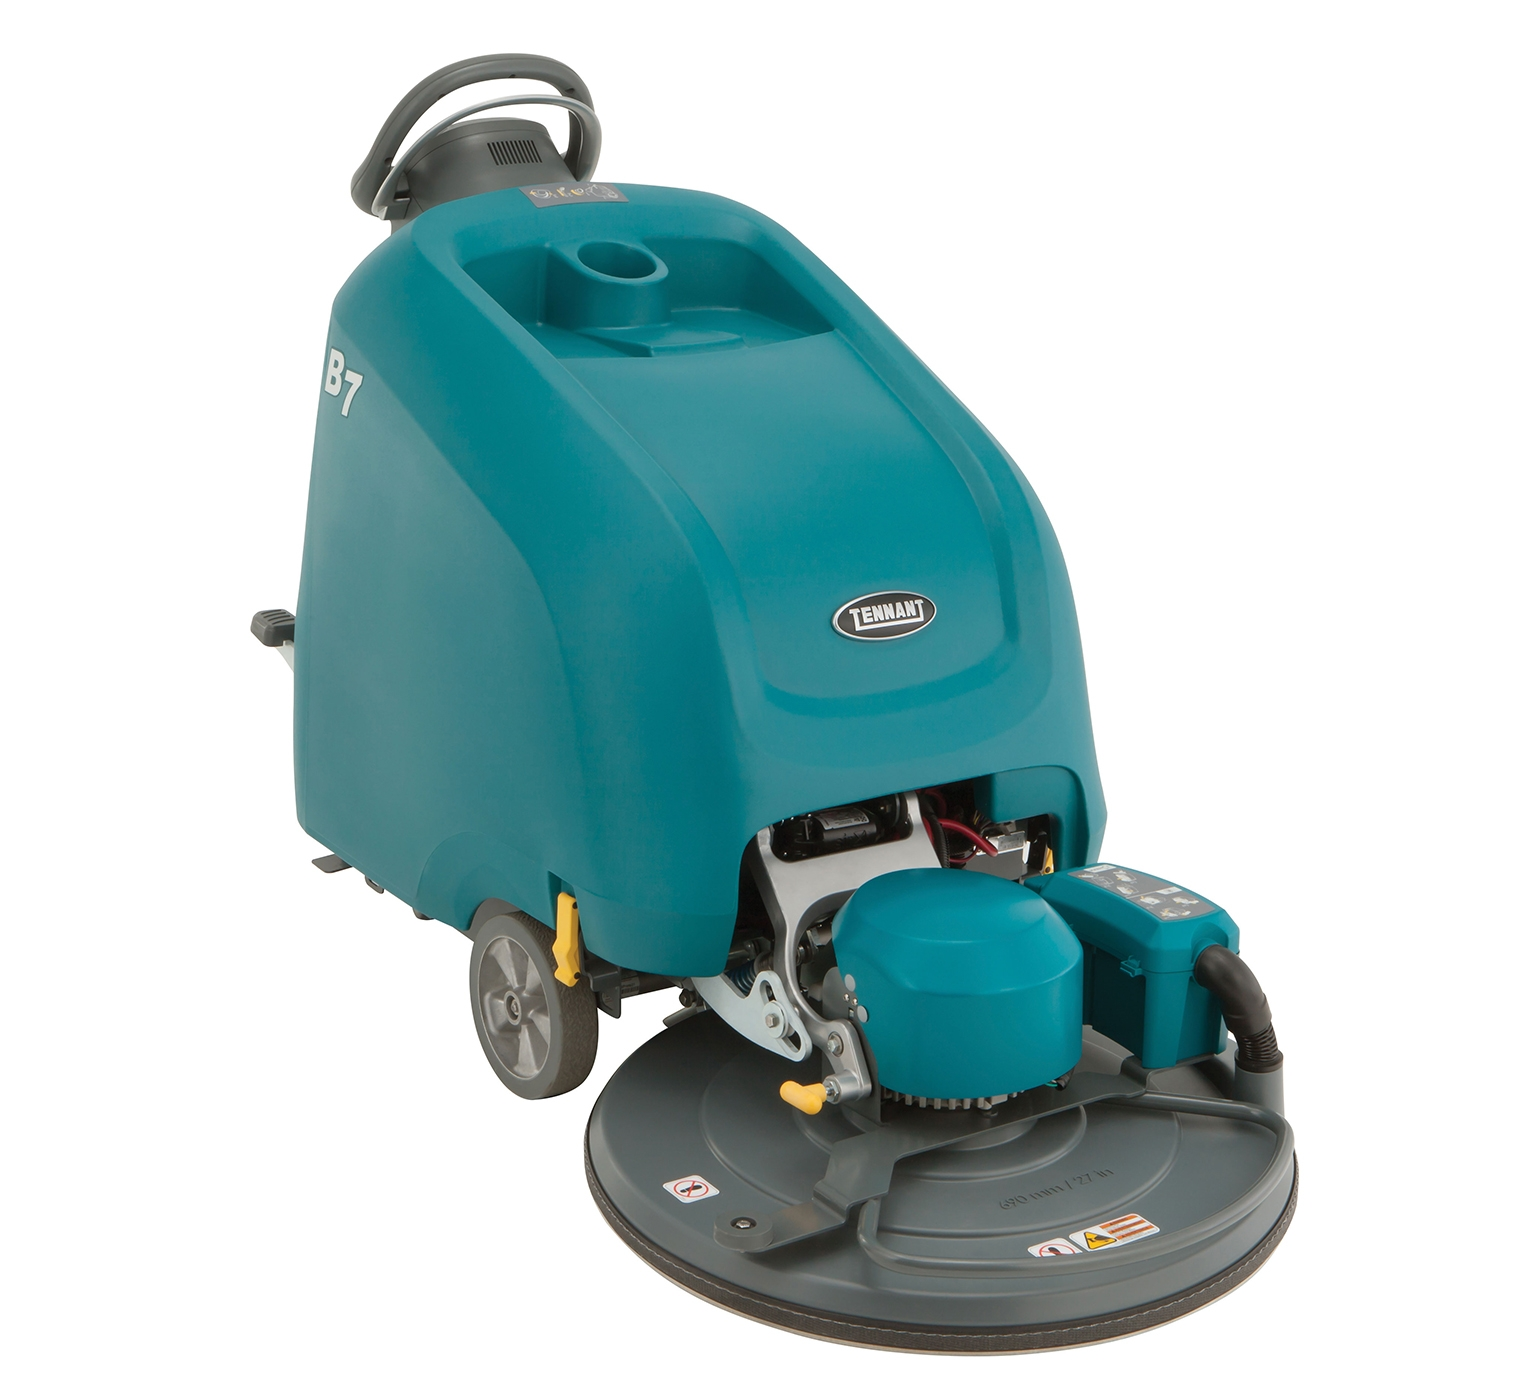 Tennant Floor Scrubber 5680 Parts